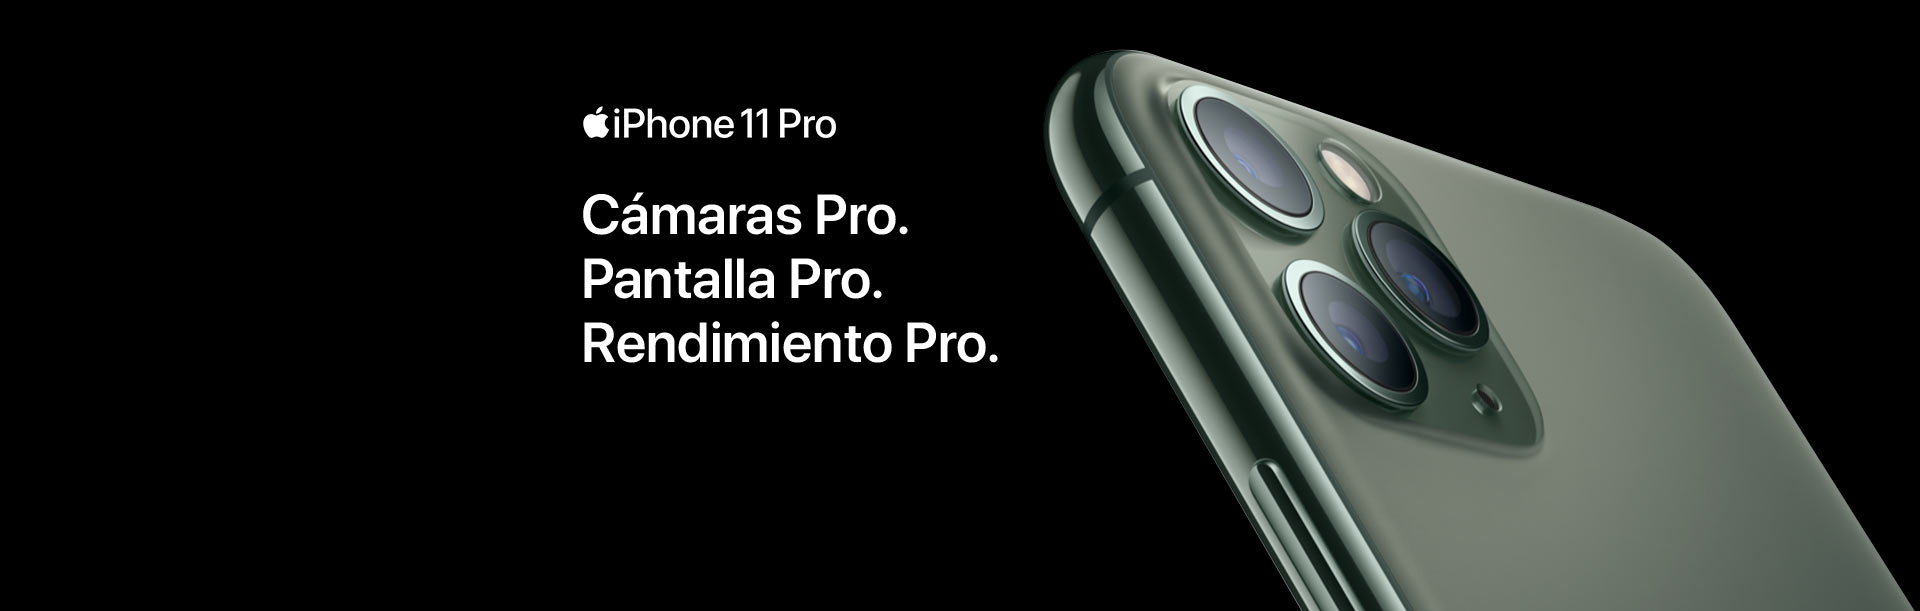 Reserva ya el nuevo iPhone 11